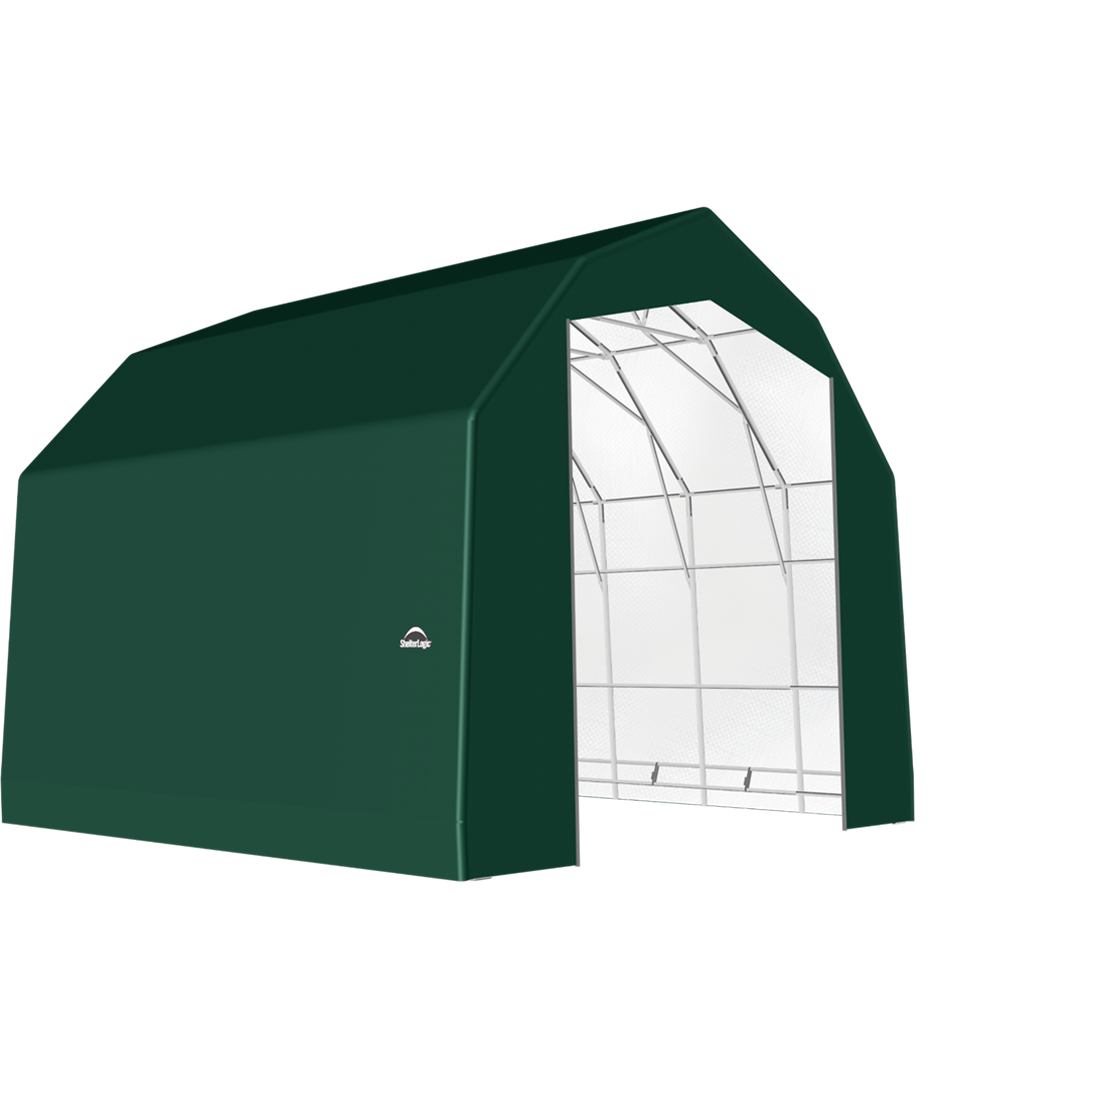 SP Barn 25X20X20 Green 14 oz PE Shelter